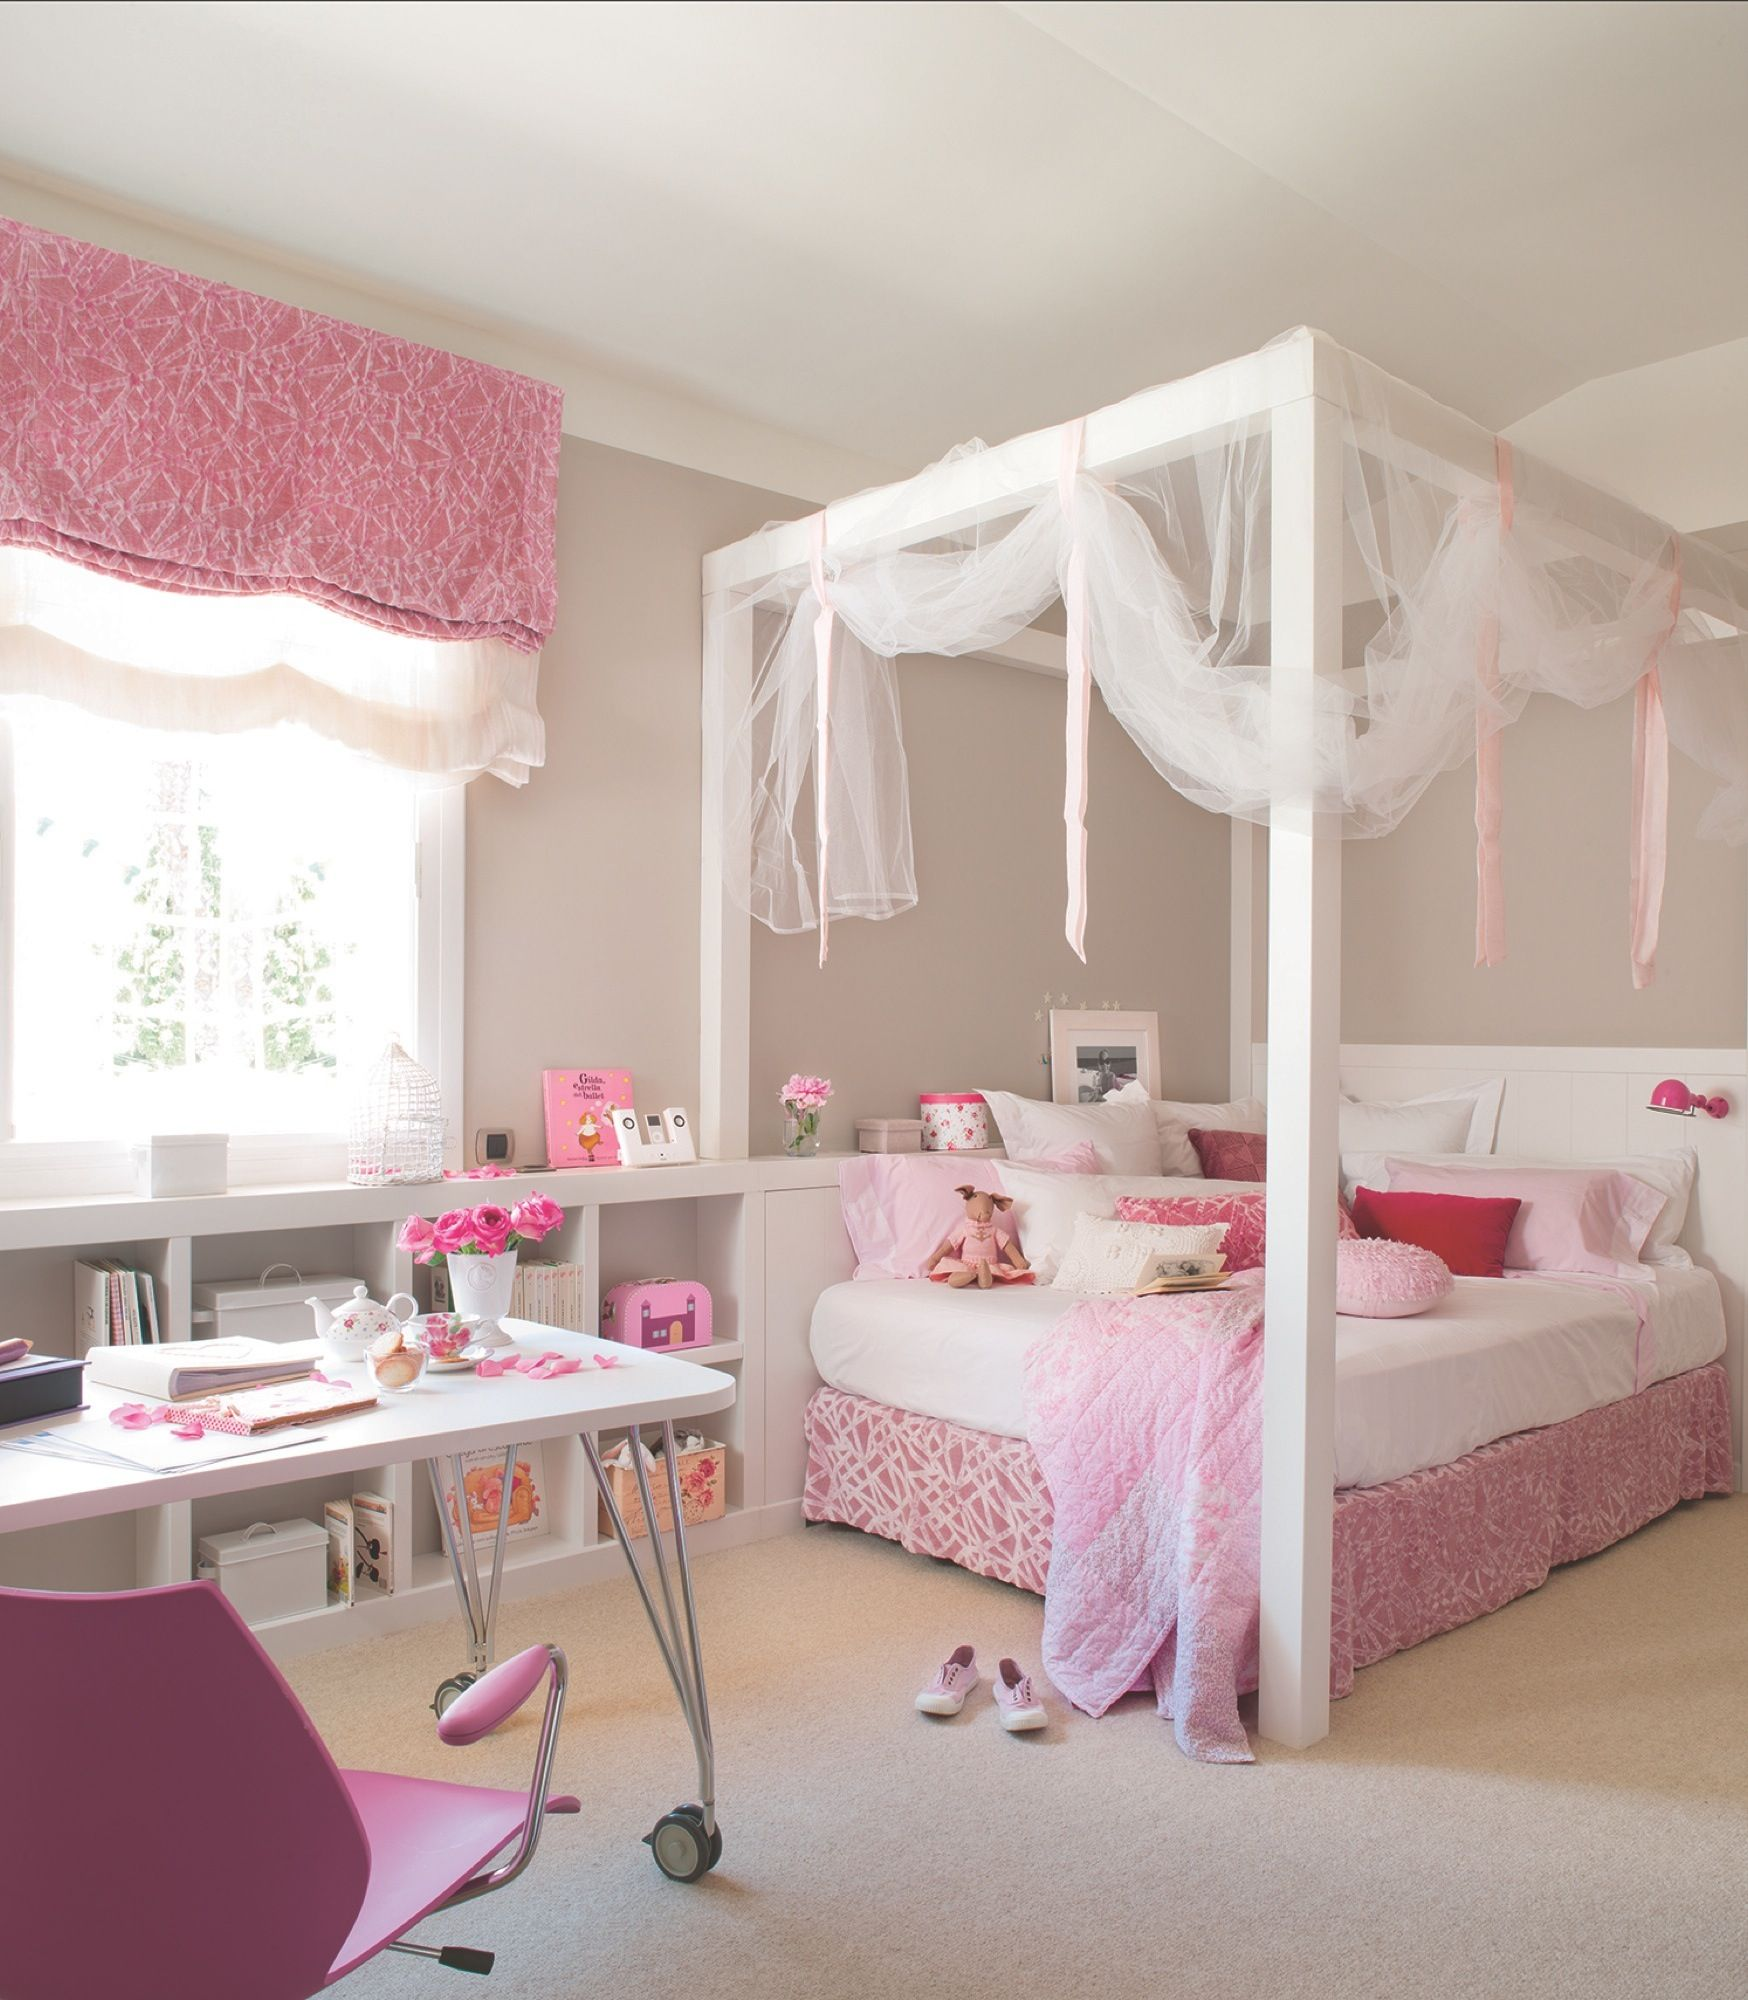 Ya soy mayor ideas para el hogar pinterest - Cortinas habitacion bebe nina ...